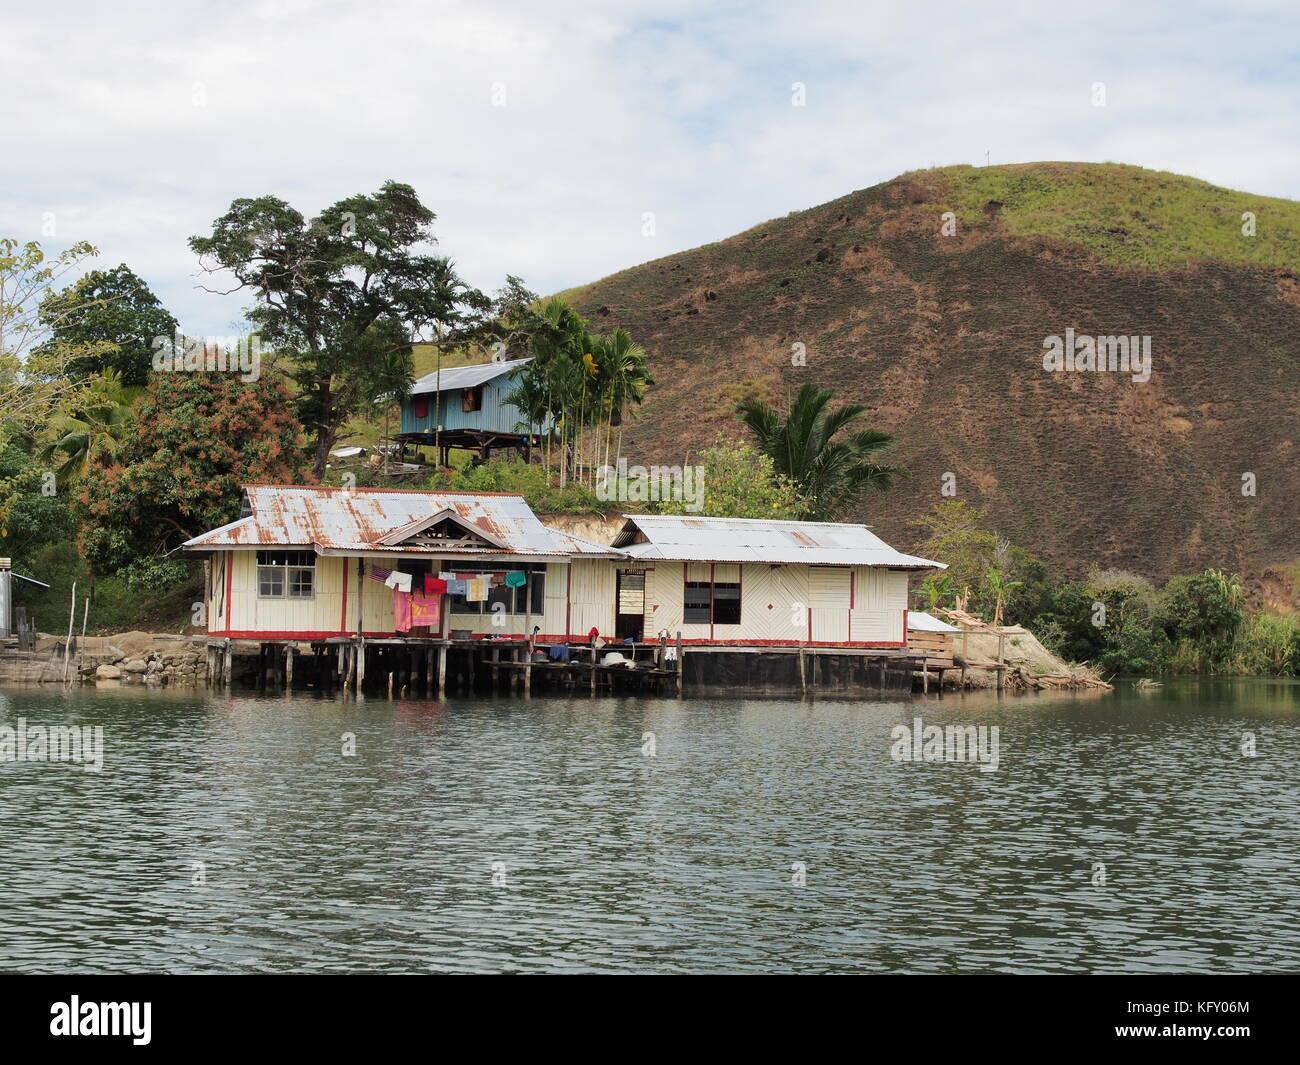 Stilt house on Lake Sentani in West Papua, Indonesia - Stock Image